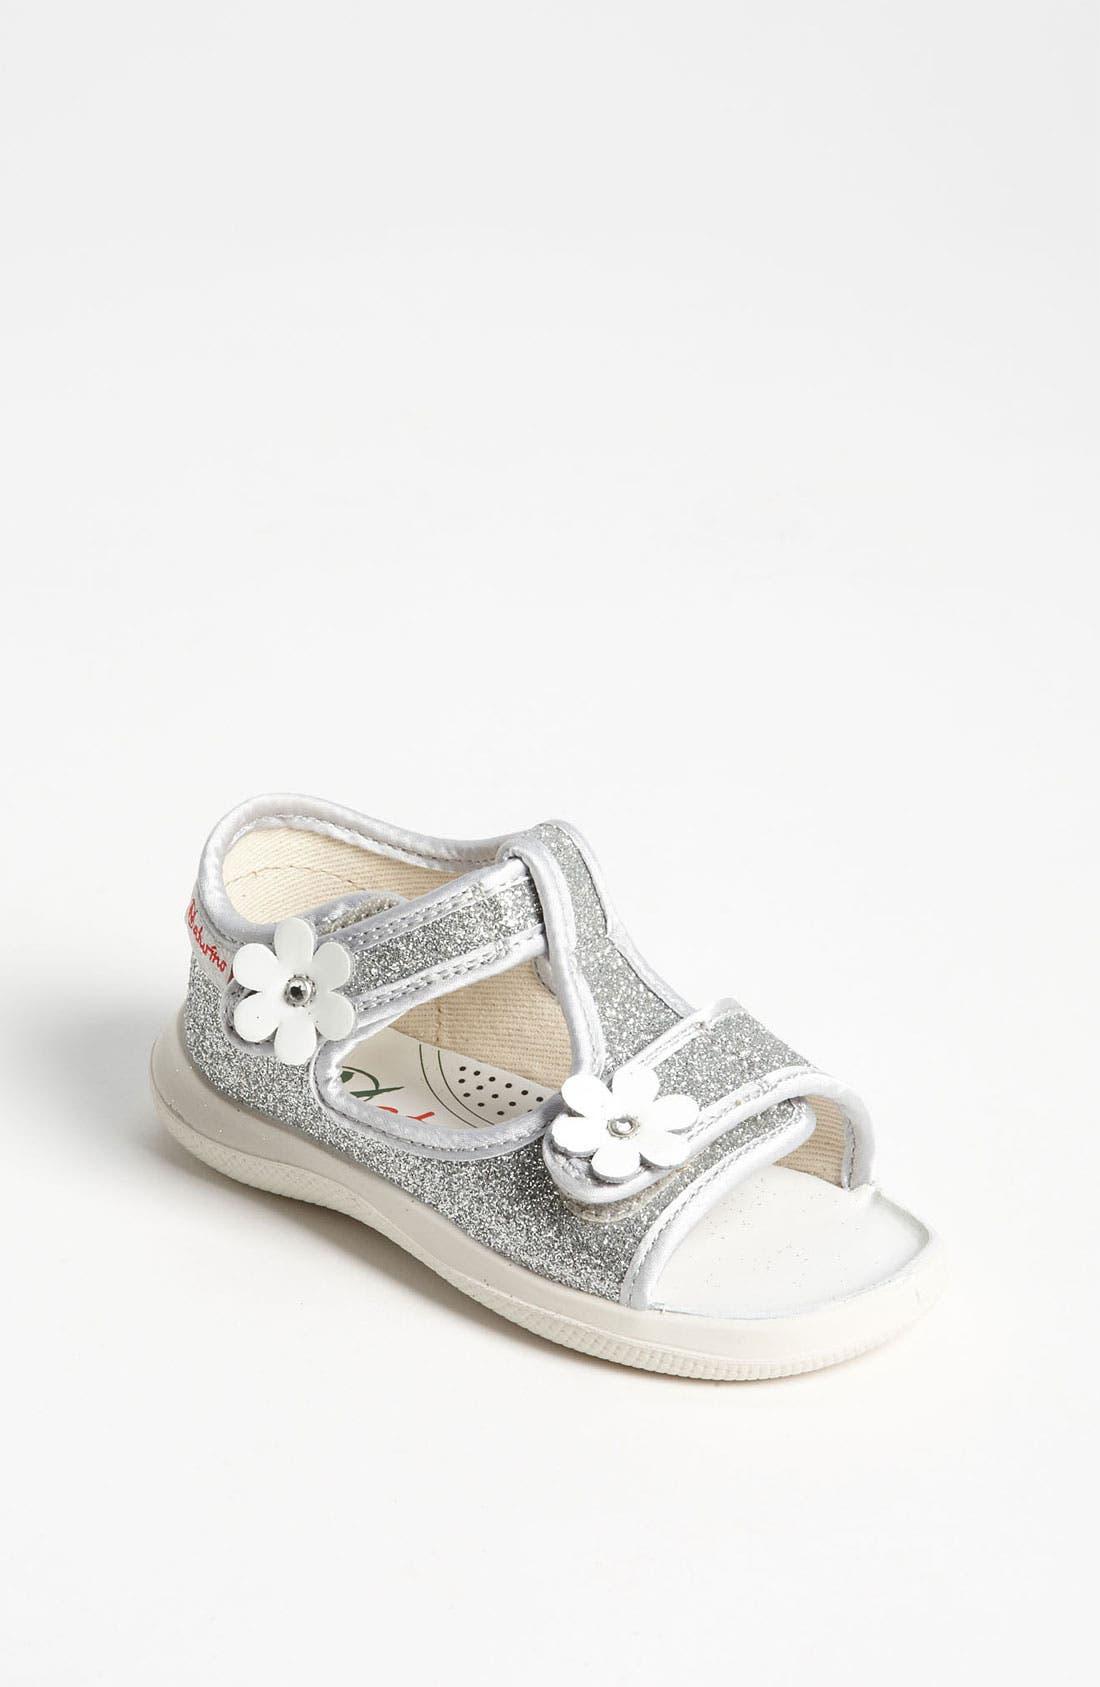 Alternate Image 1 Selected - Naturino '7850' Sandal (Baby & Walker)